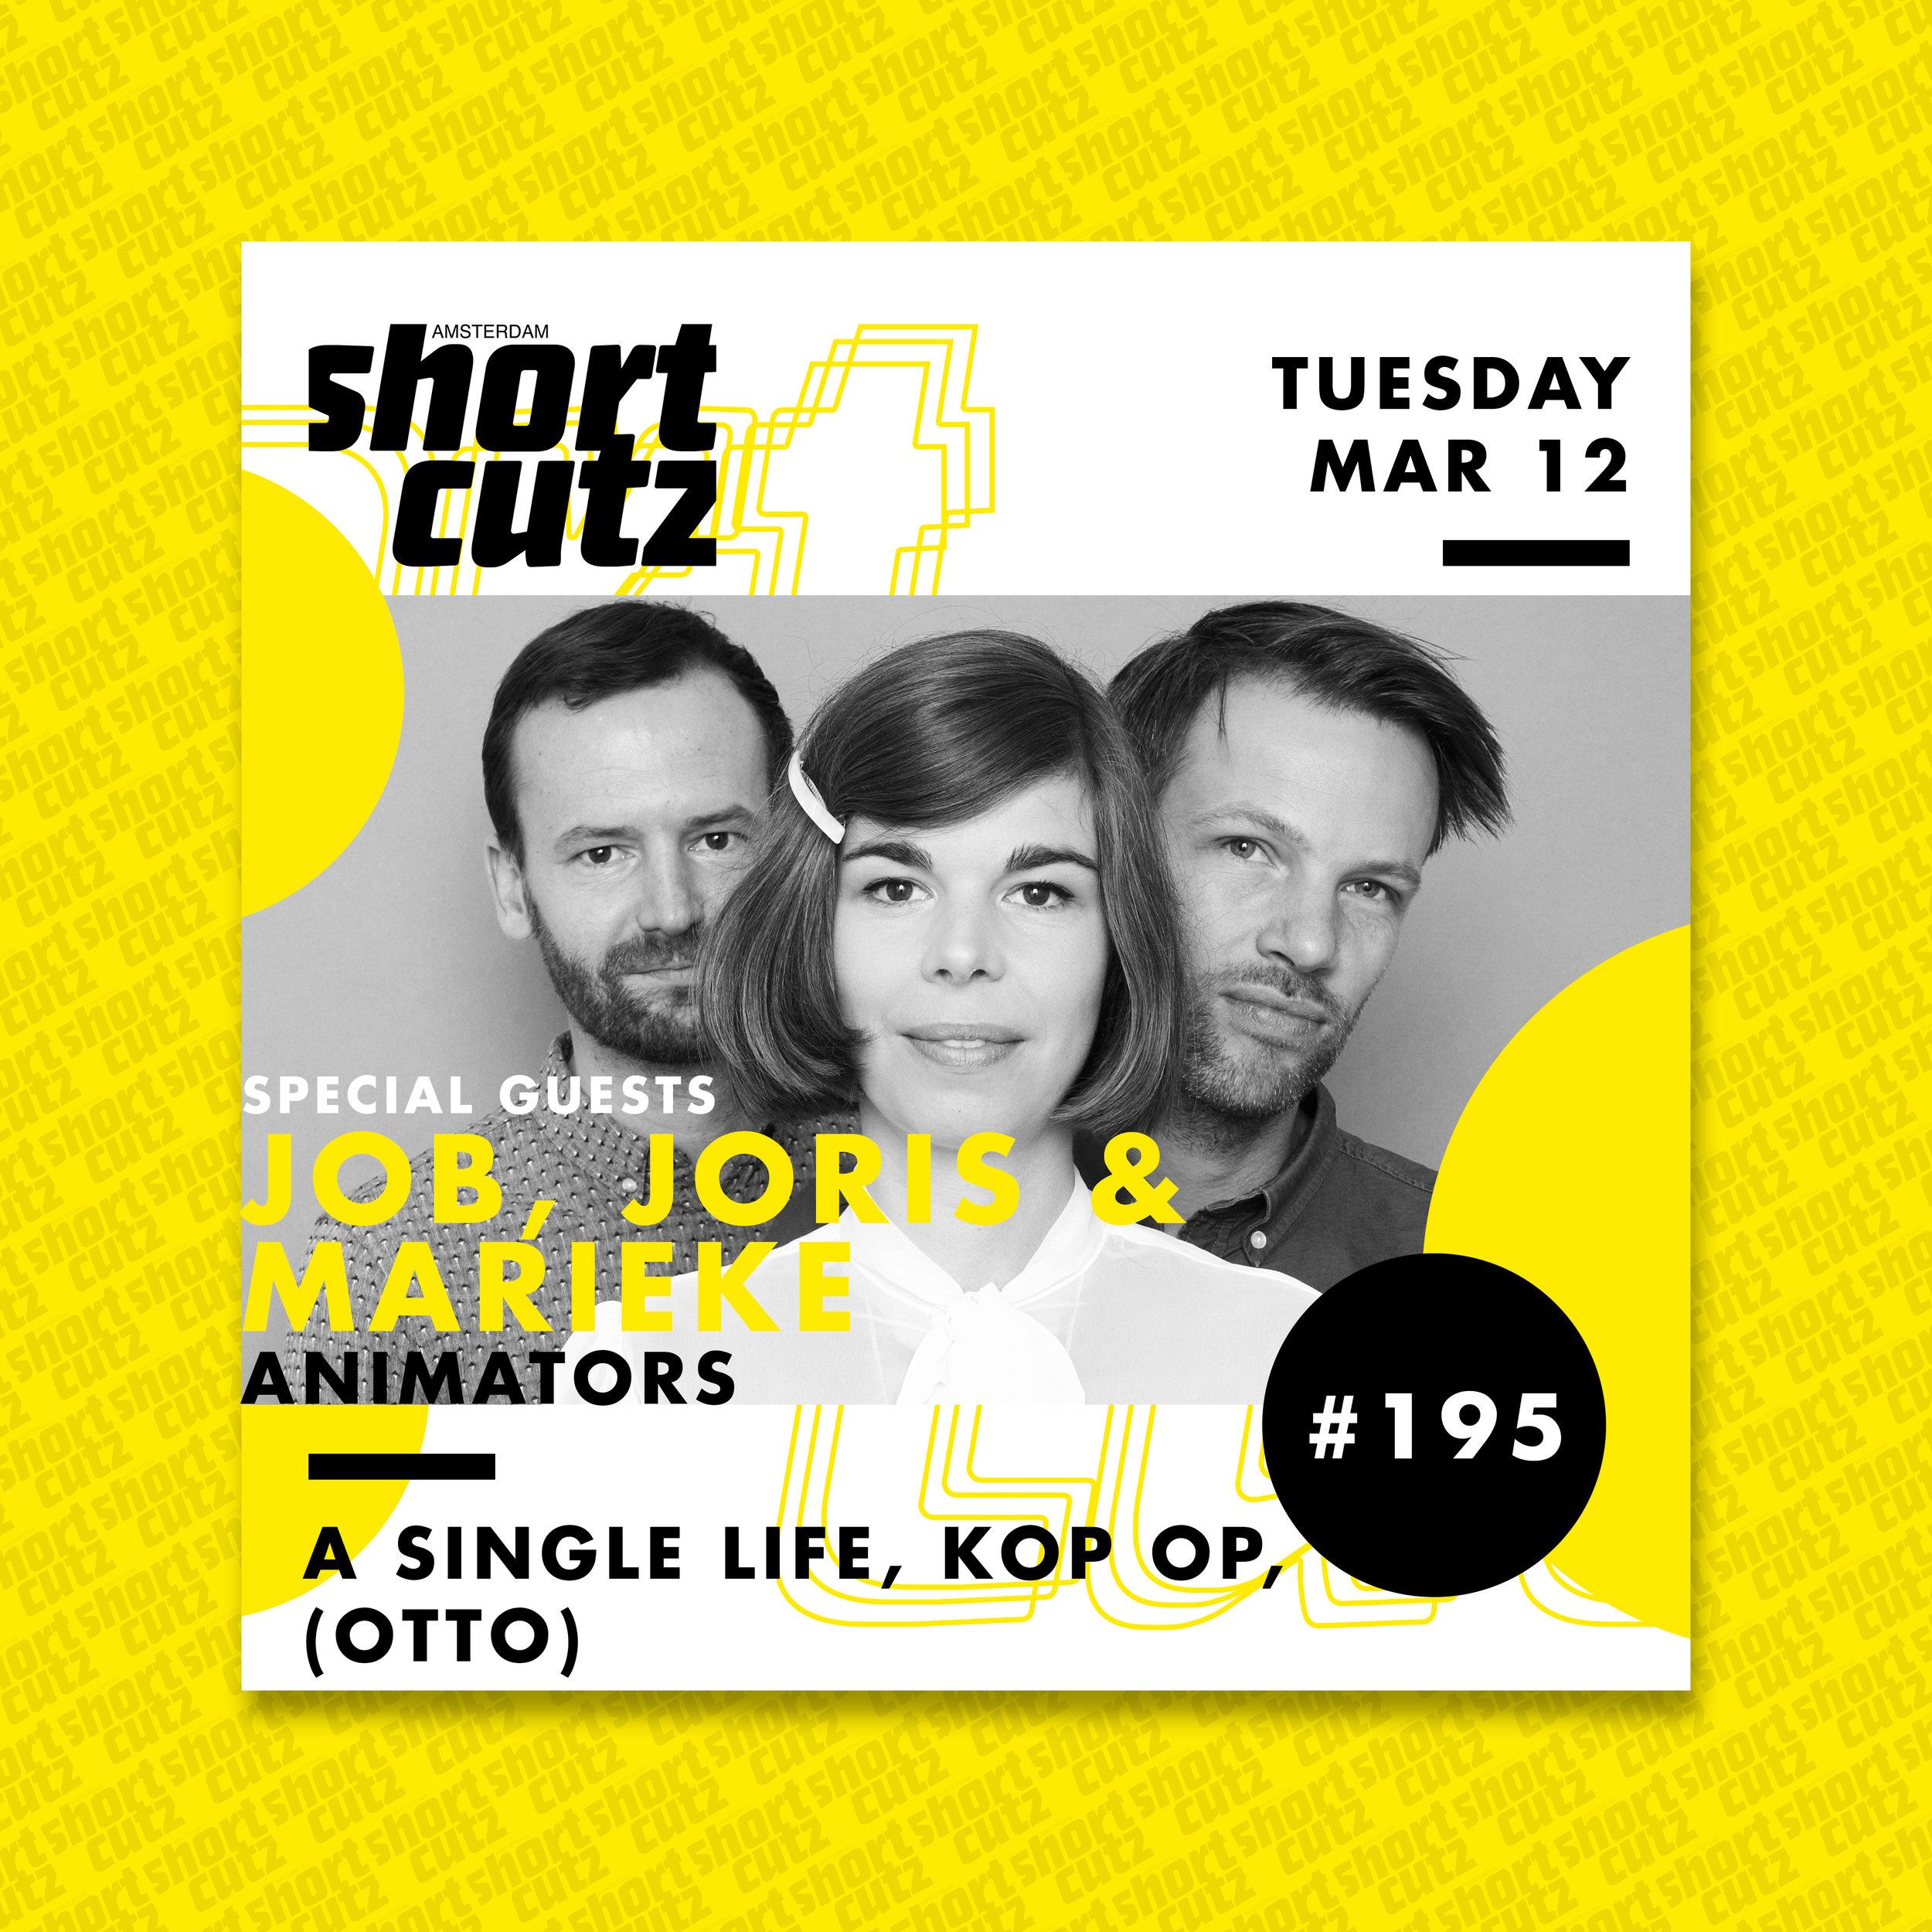 #195 Poster Job Joris Marieke.jpg